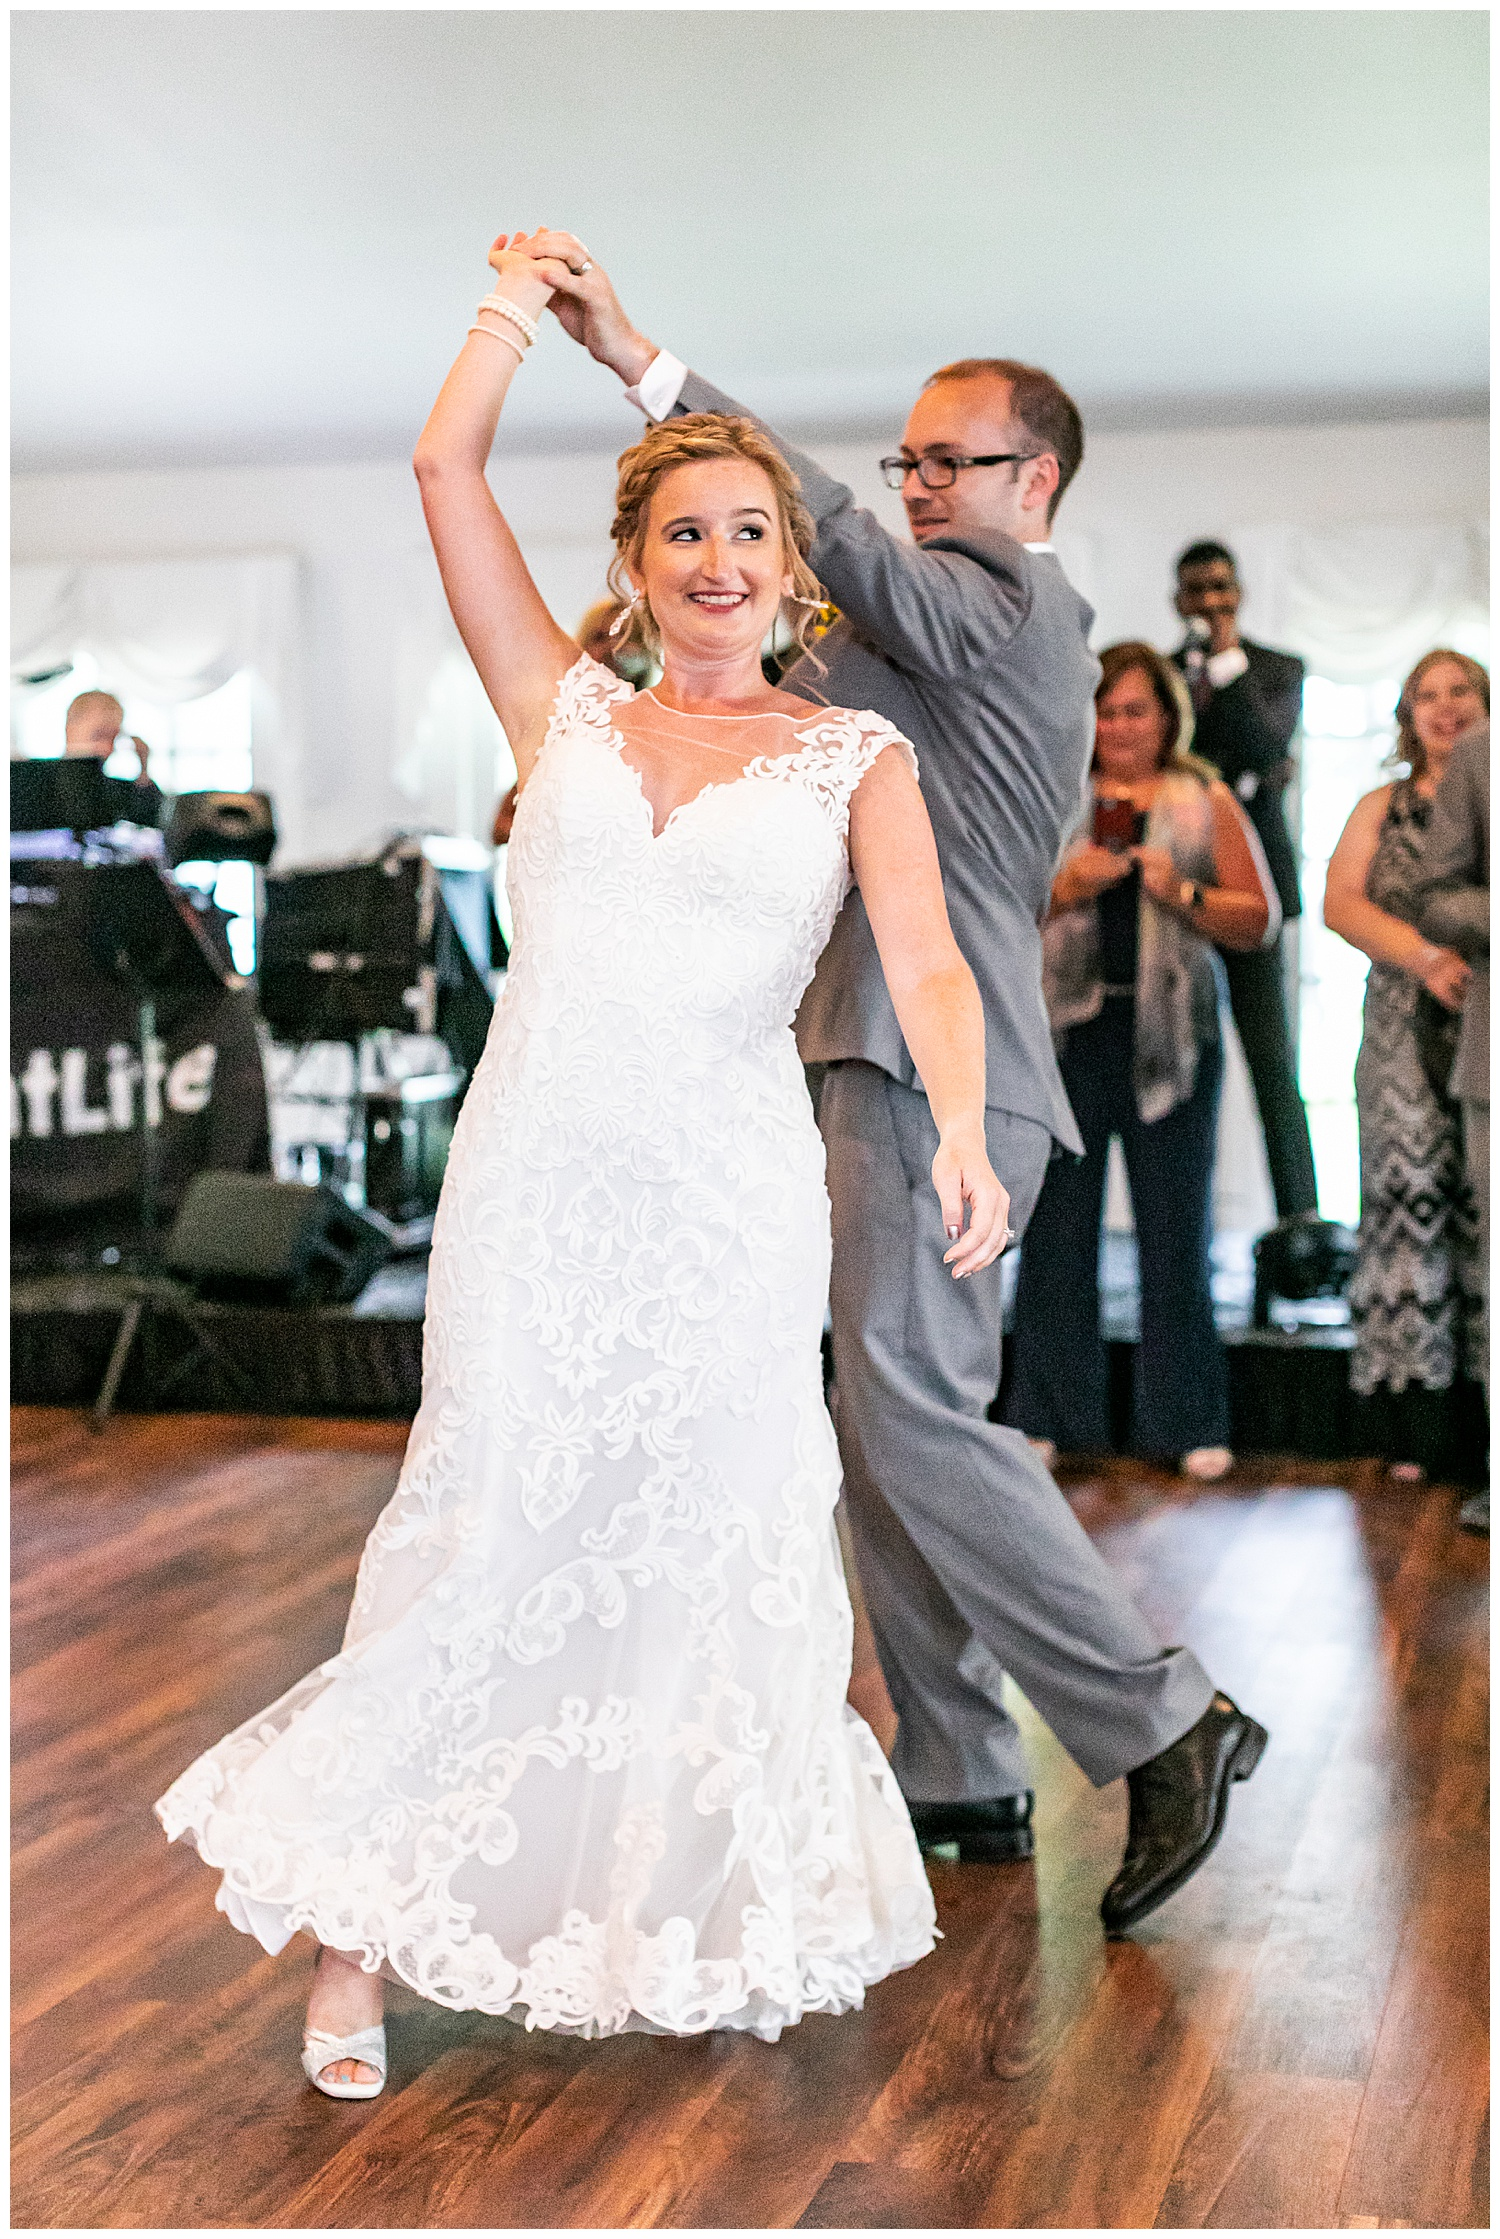 Michelle Shaun Antrim 1844 Wedding Living Radiant Photography photos_0168.jpg